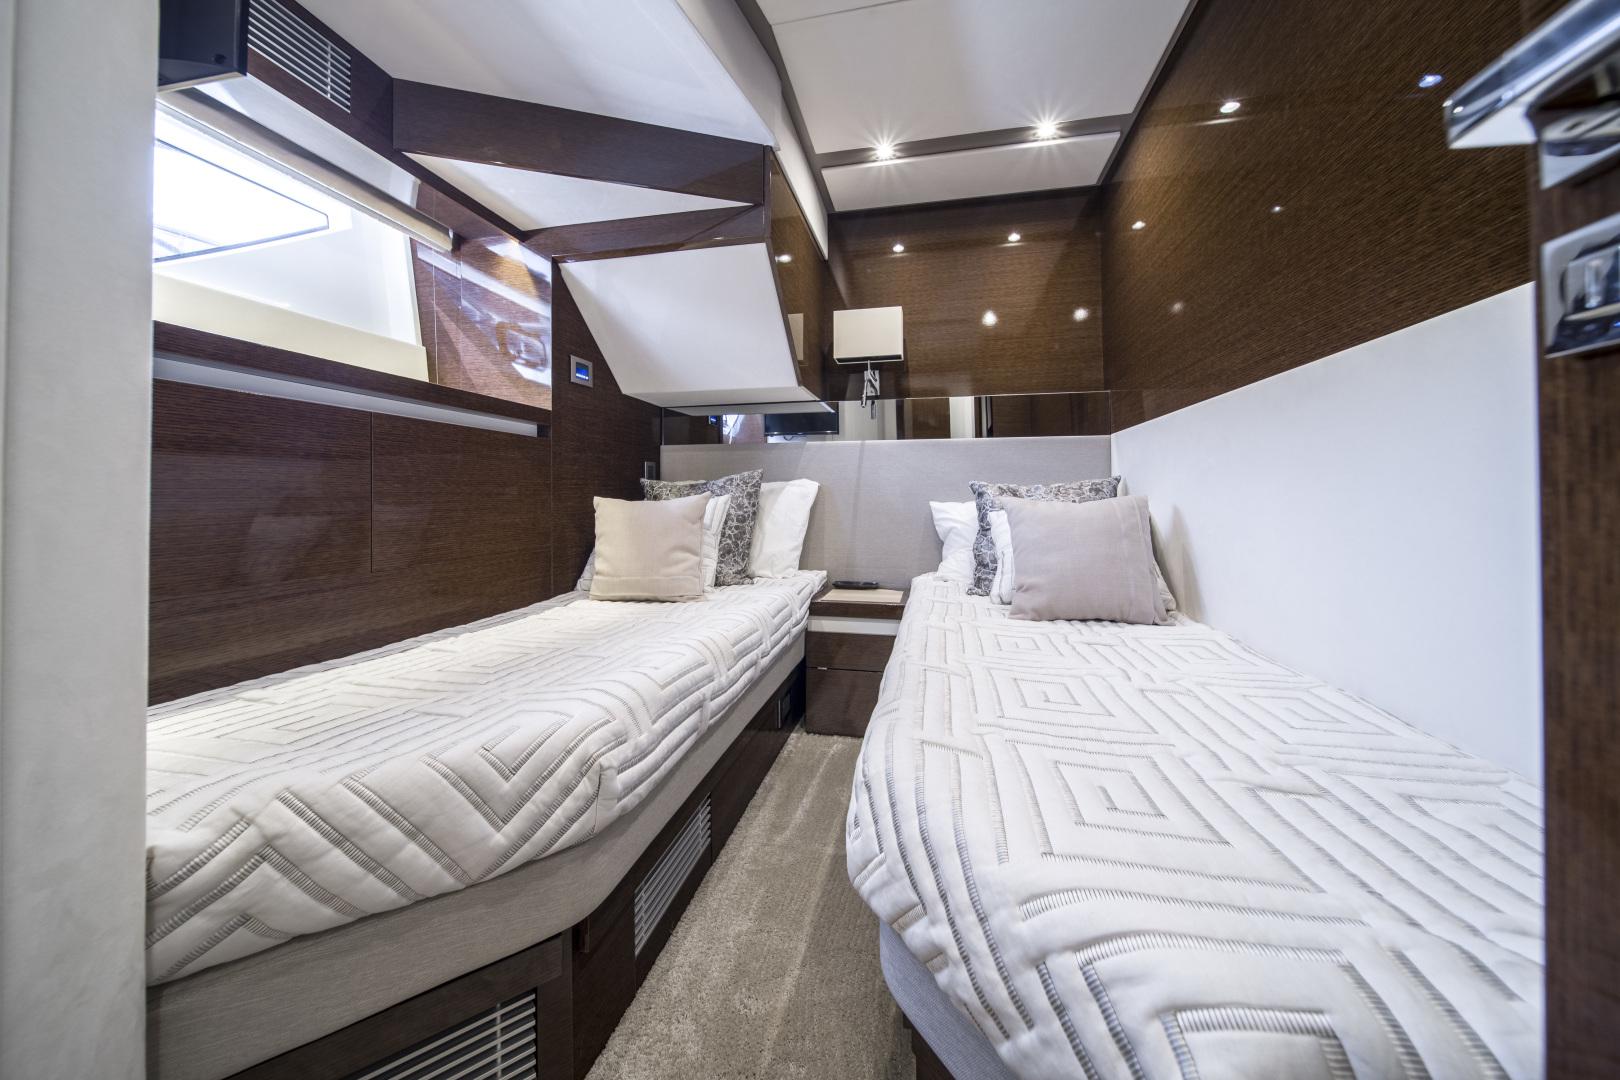 Prestige-680 Flybridge 2018-Seduction Sarasota-Florida-United States-2018 68 Prestige 680 Flybridge  Port Guest Stateroom-1498940 | Thumbnail